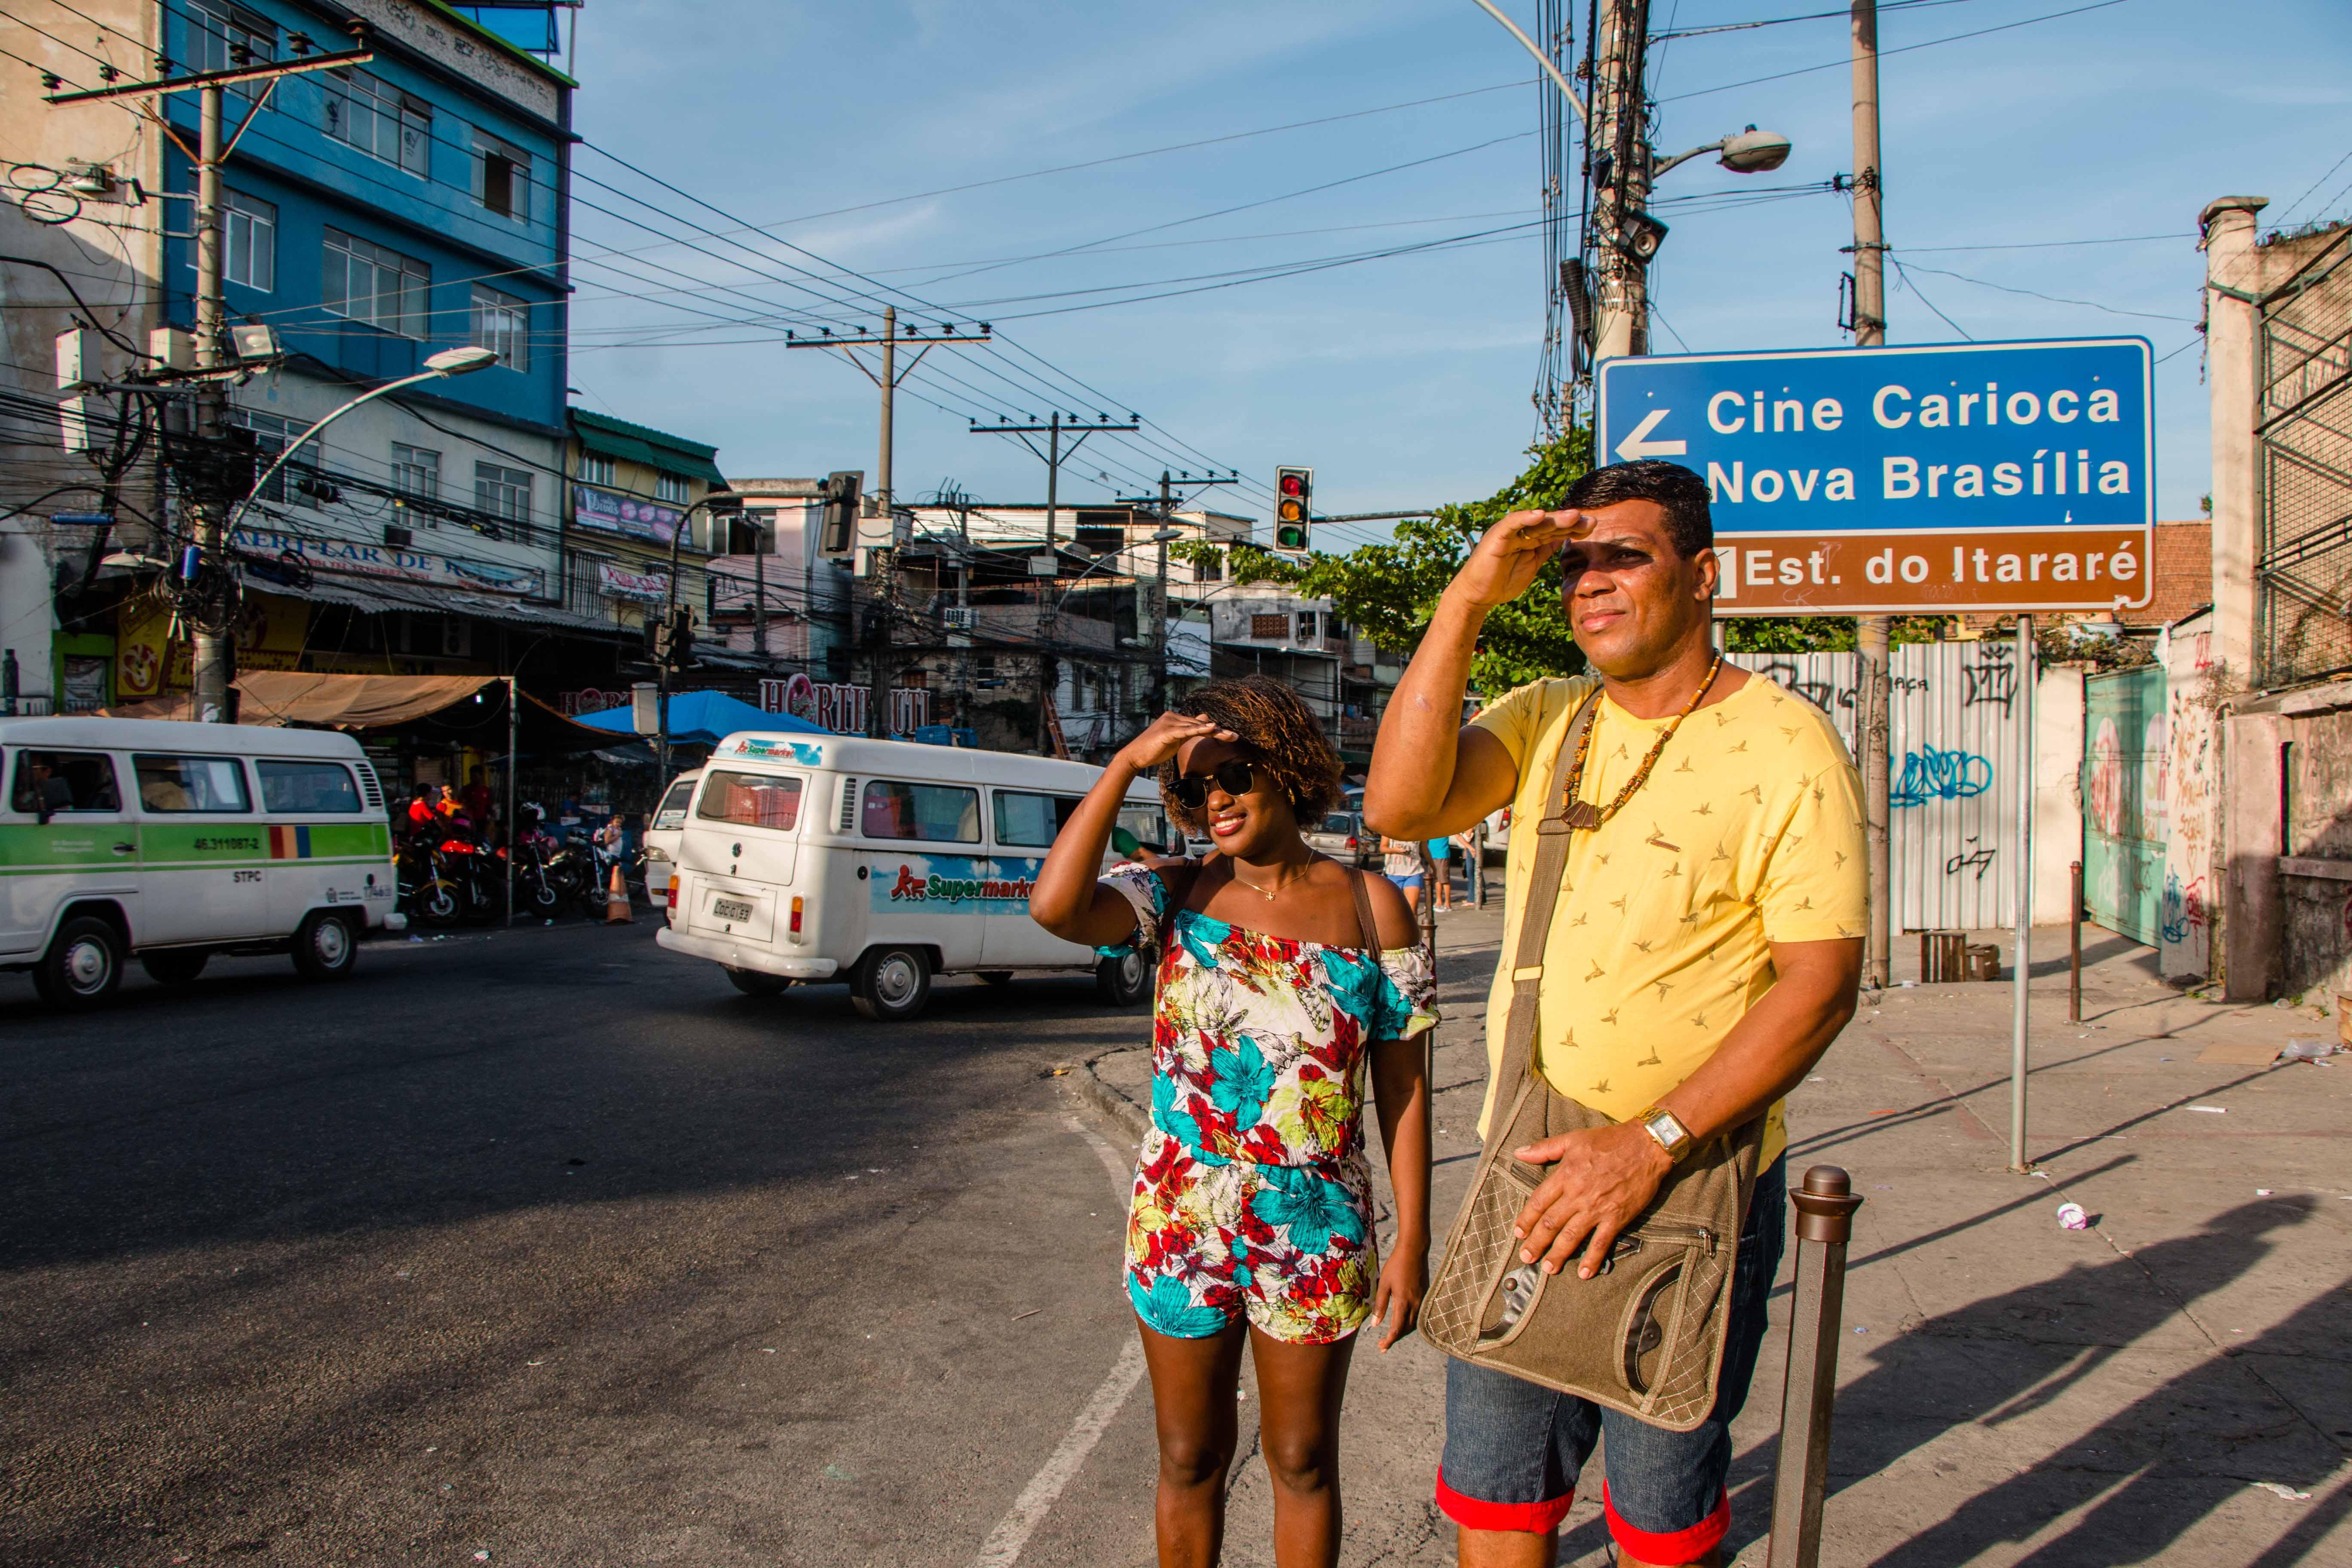 Foto: Renato Moura/Jornal Voz da Comunidade